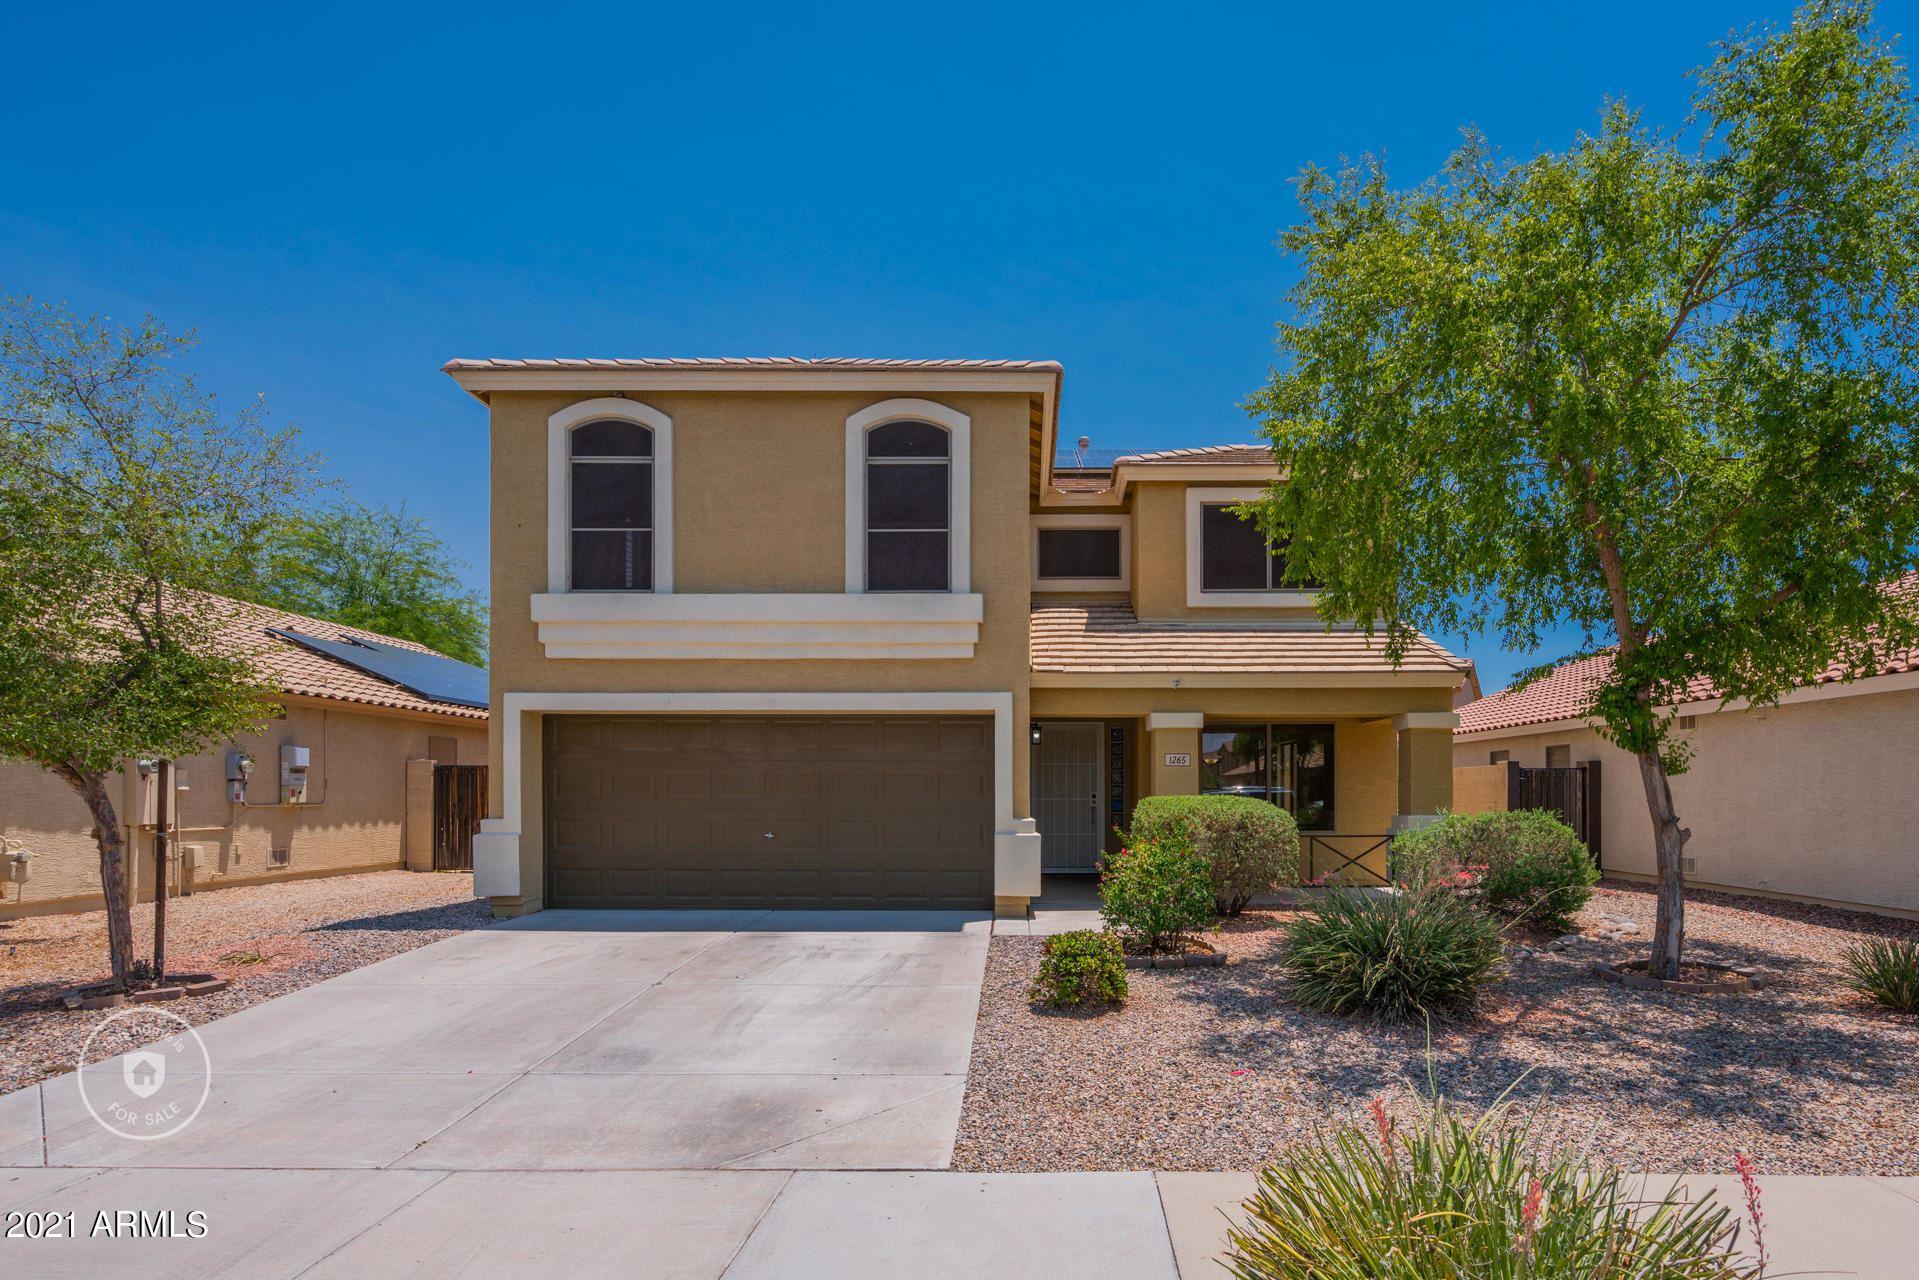 1265 N 161ST Avenue, Goodyear, AZ 85338 - MLS#: 6257123